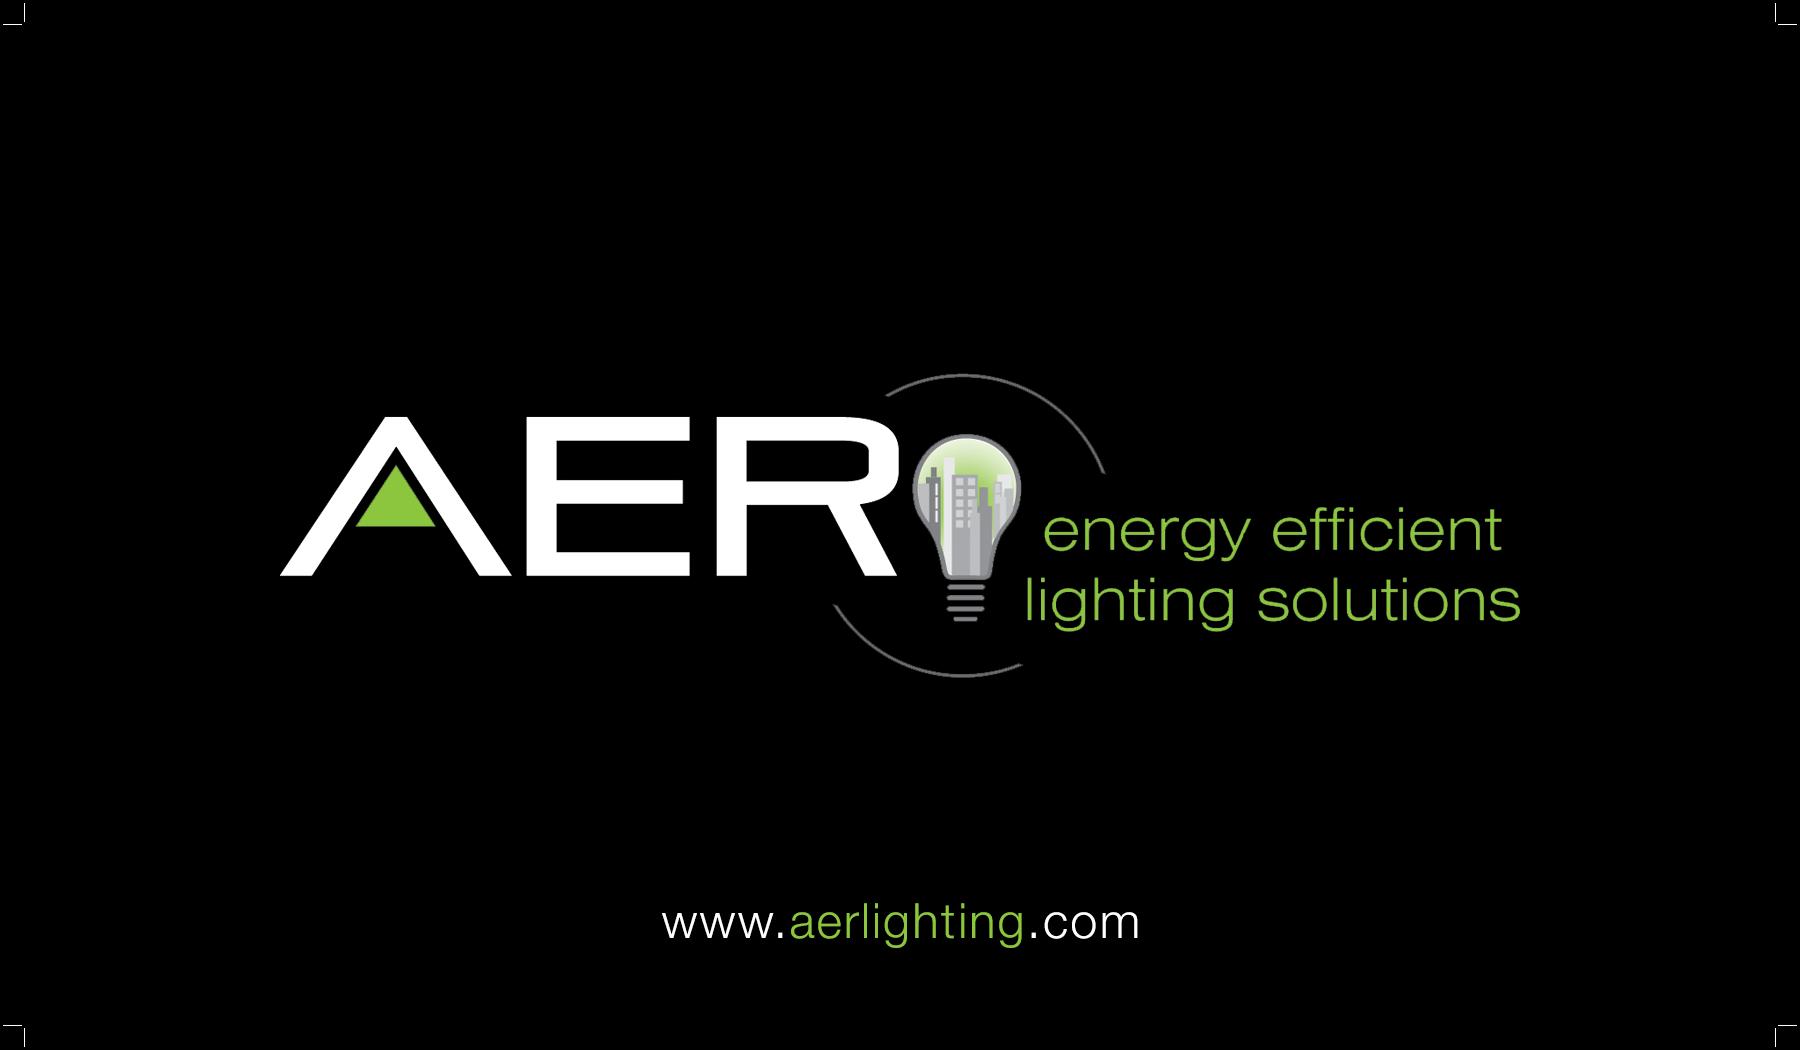 Aer Lighting Business Card